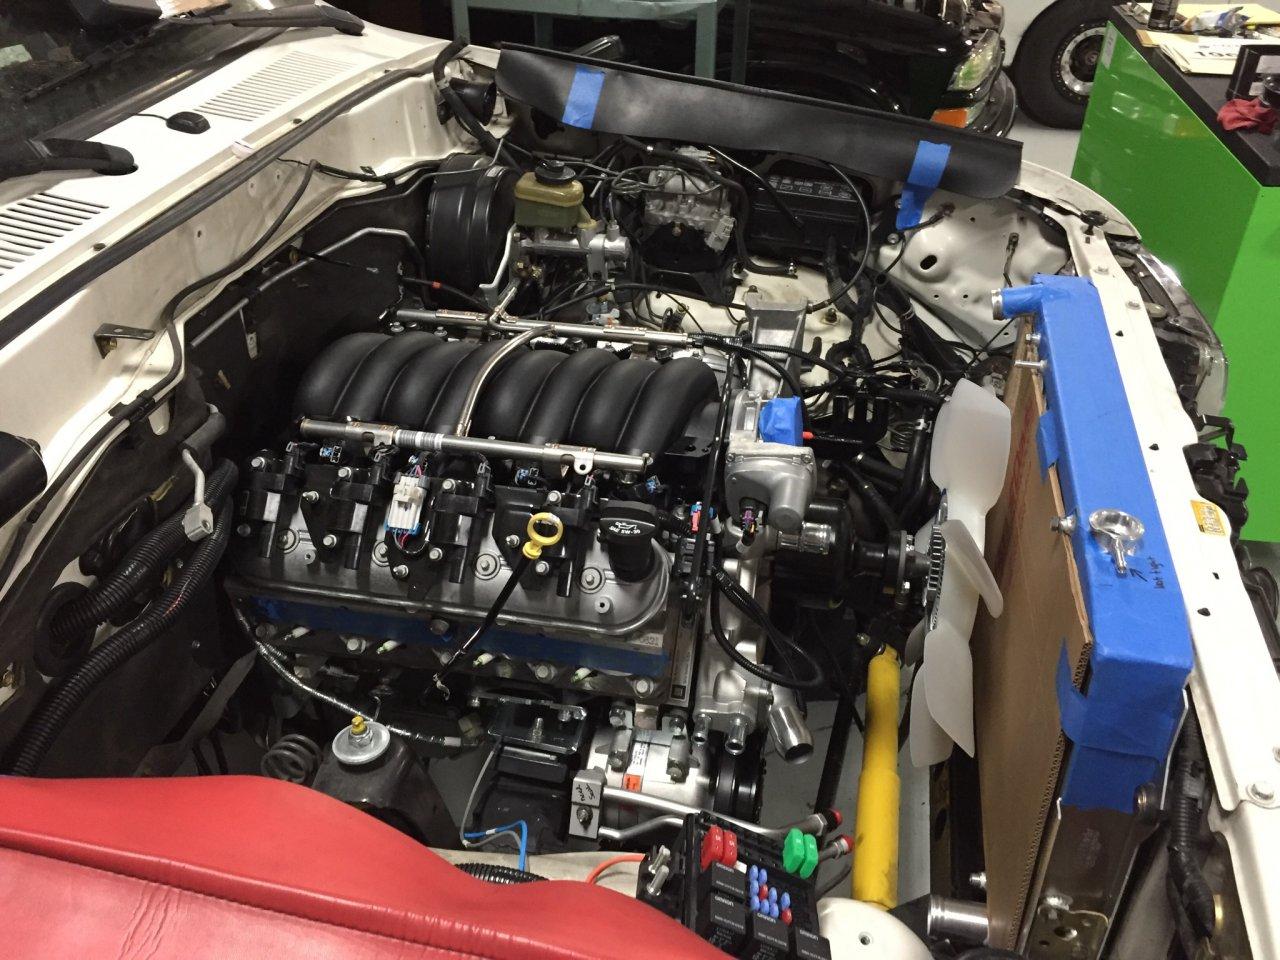 8x Series V8 Swaps | IH8MUD Forum